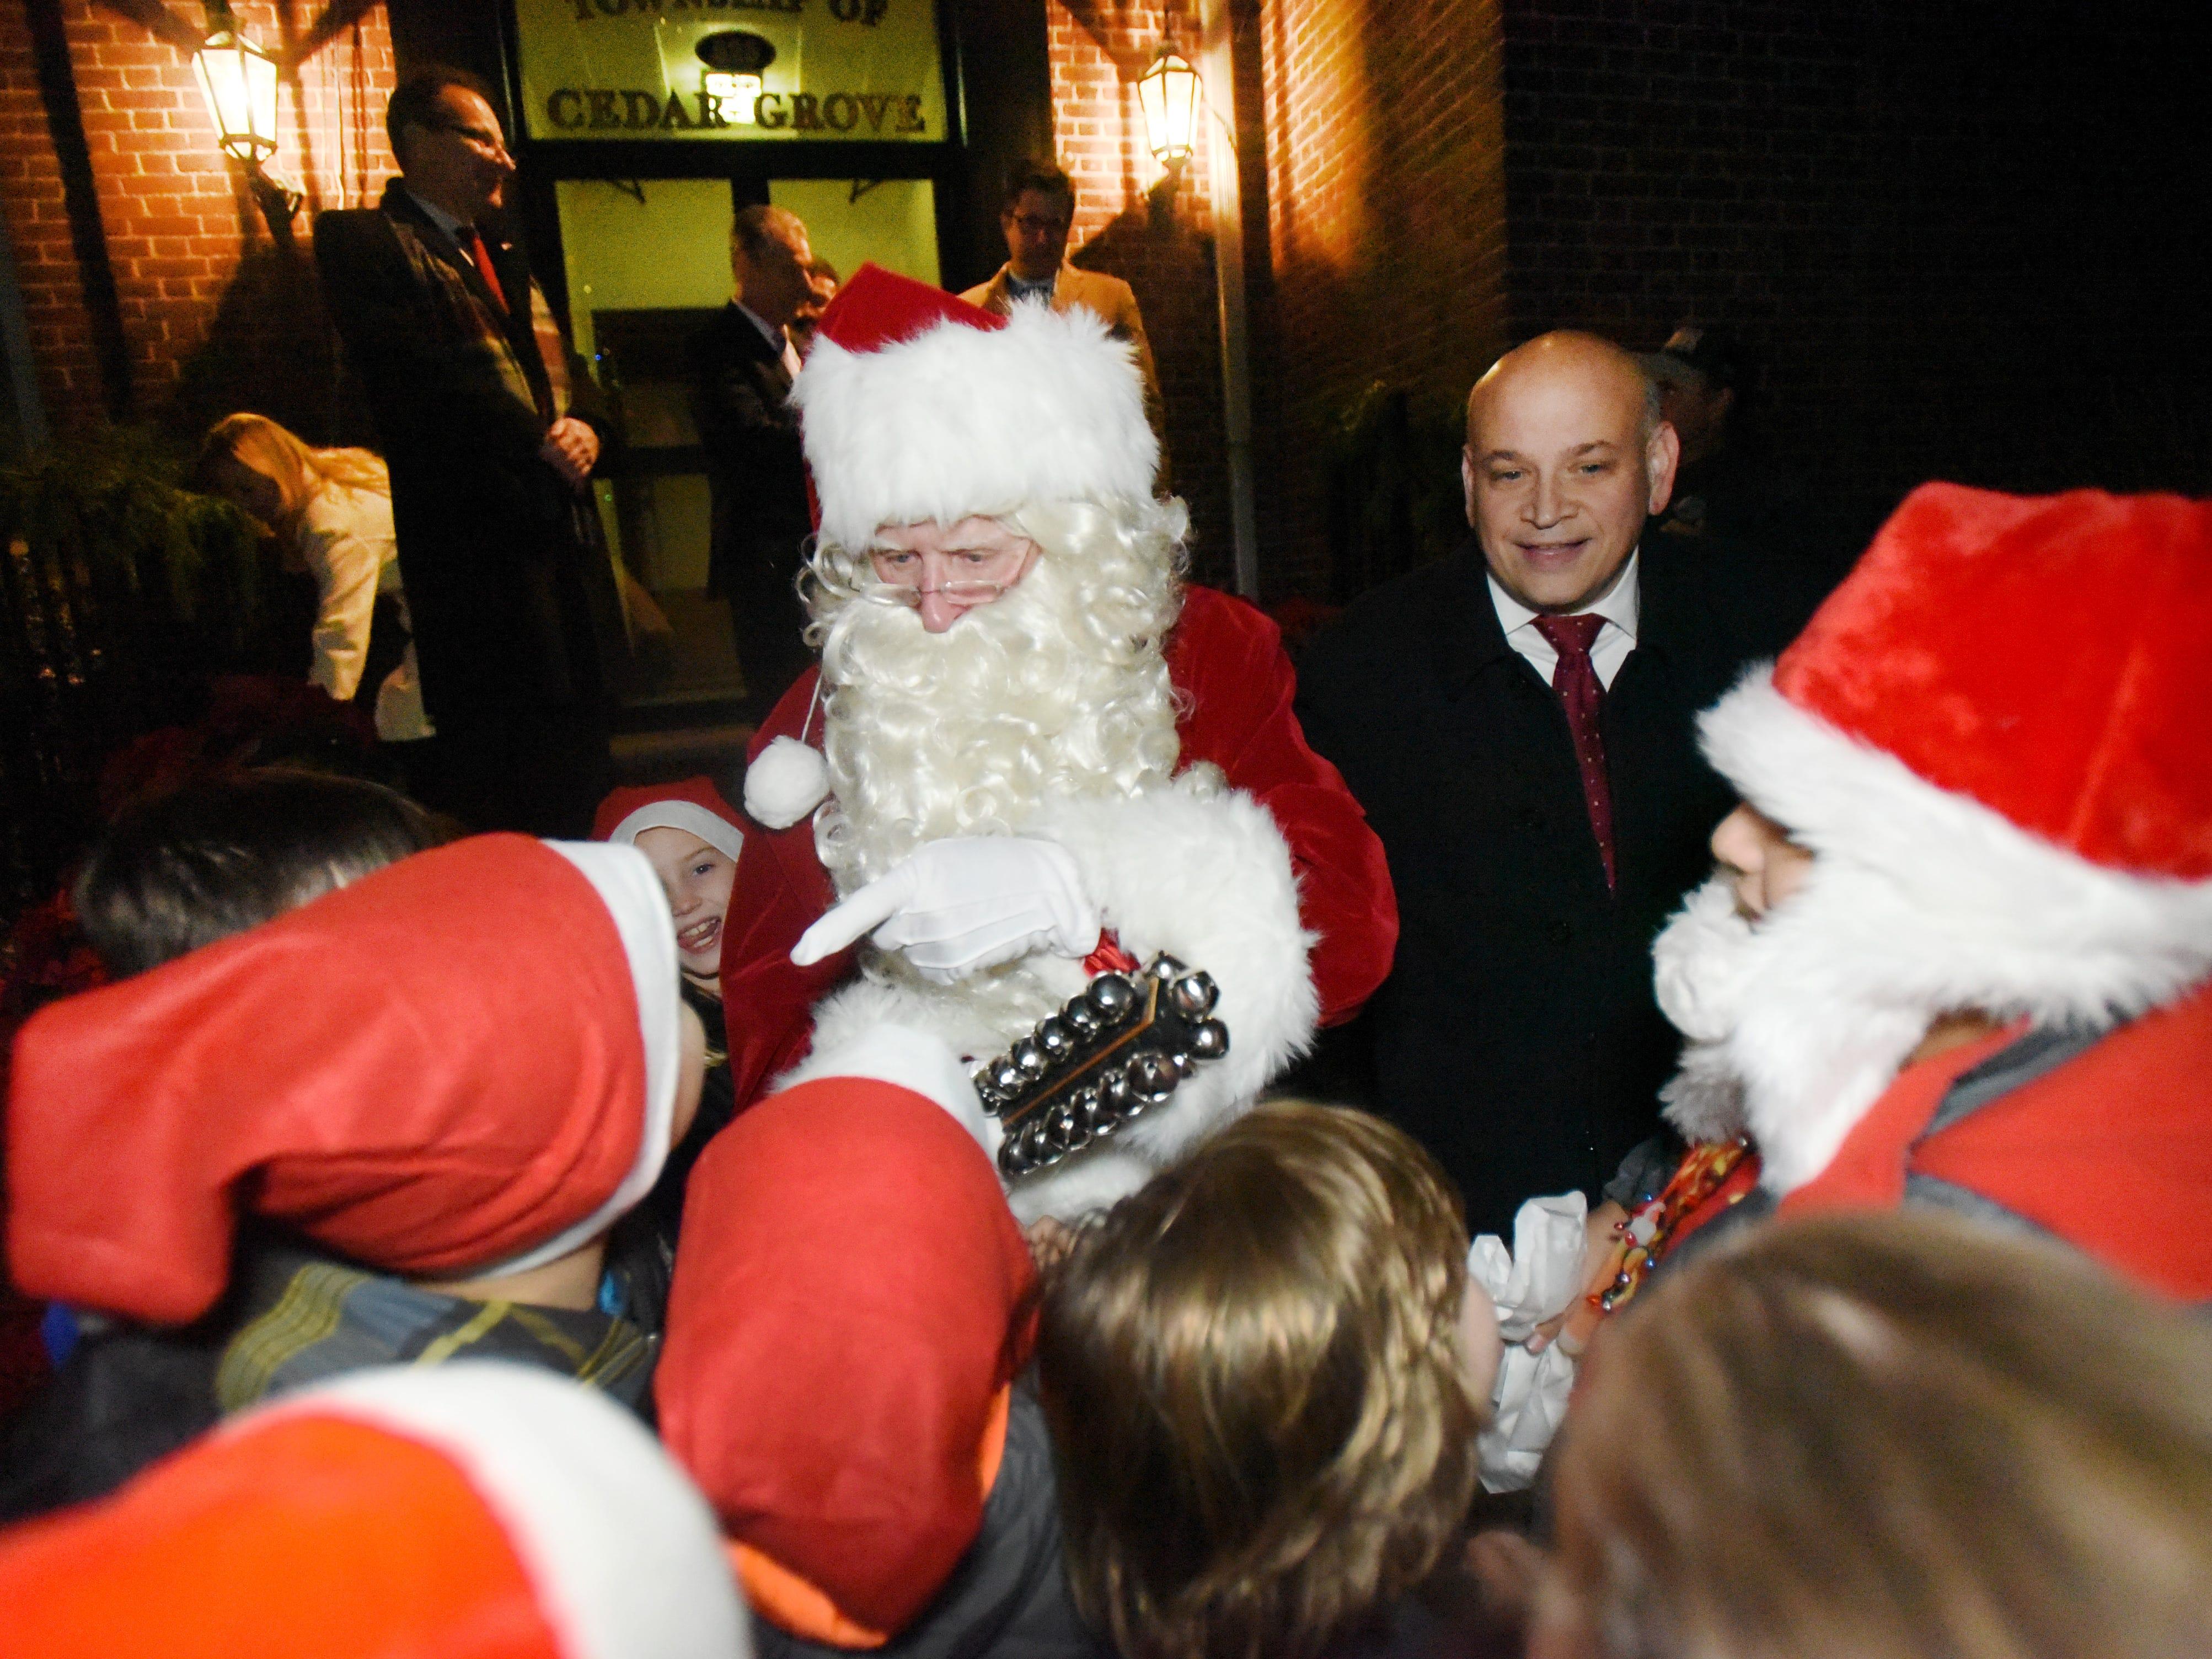 As Mayor Joseph Cicala (R) looks on, Santa (Kris Kringle) greets children following the Christmas Tree Lighting ceremony at Cedar Grove Town Hall on 12/03/18.